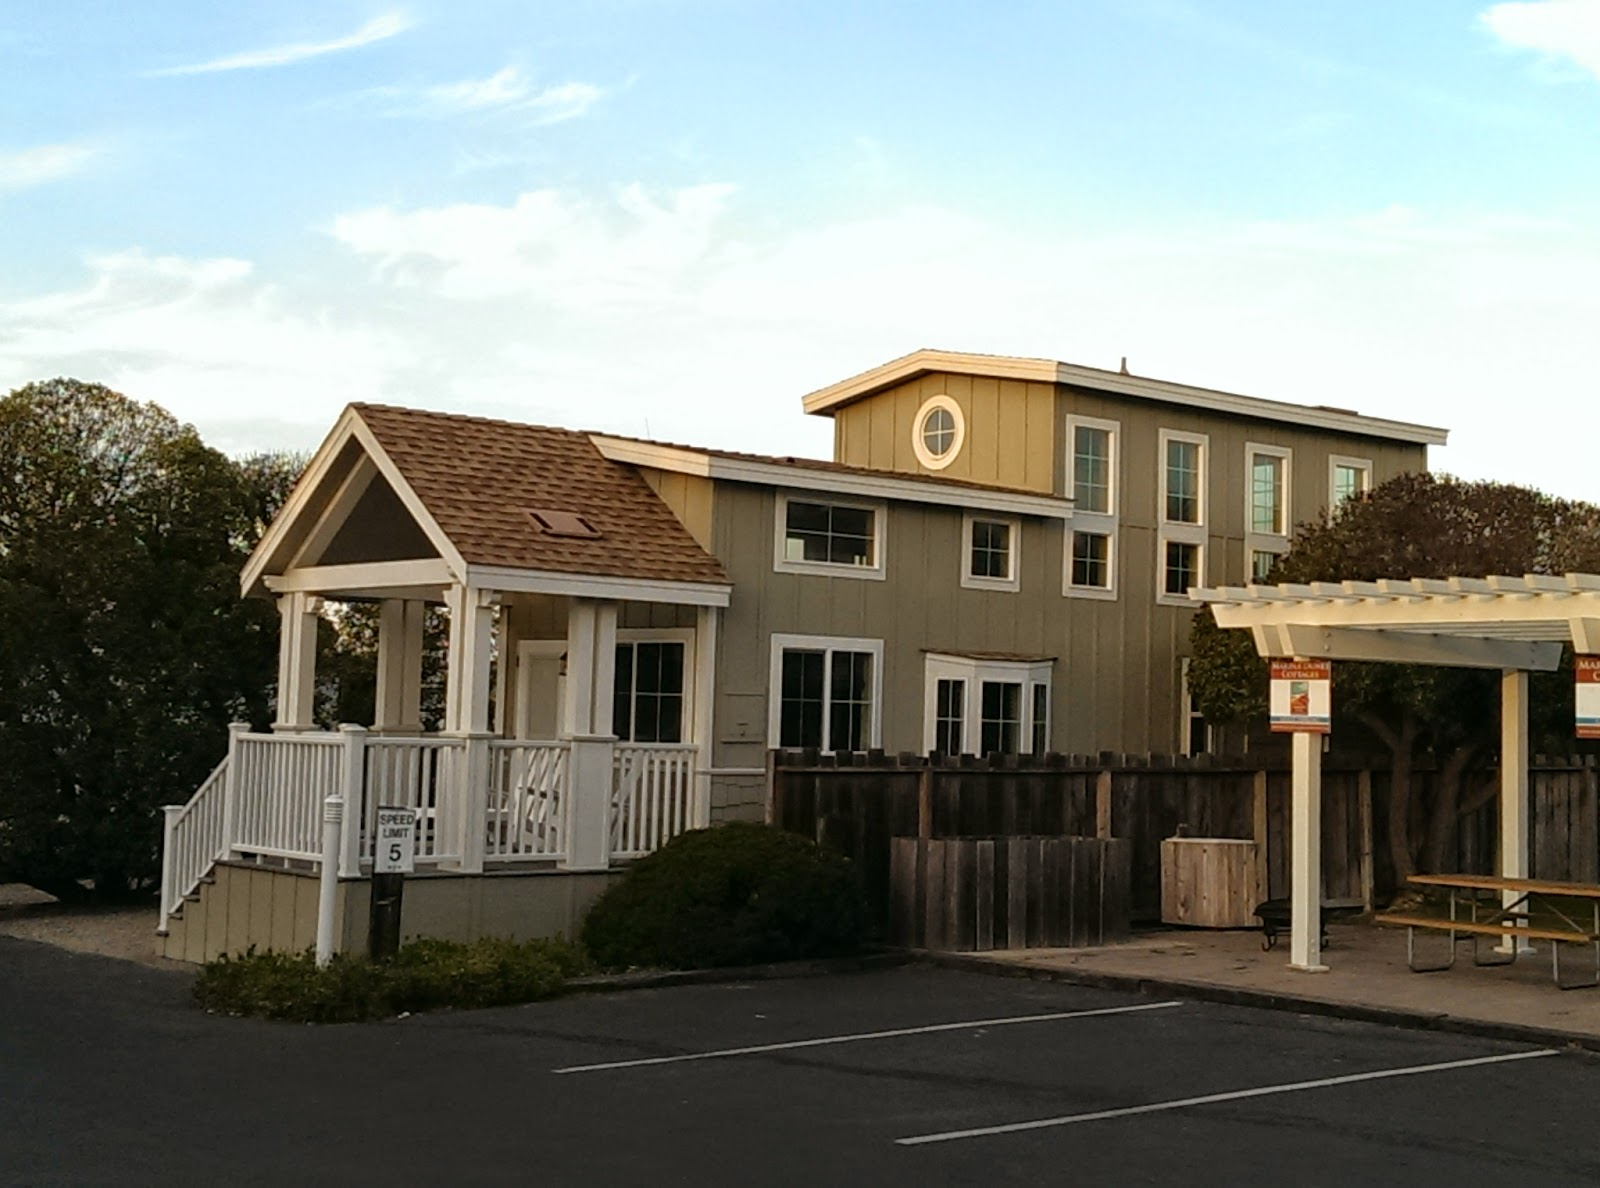 Monterey. Camping, RVing, Rentals, Marina Dunes